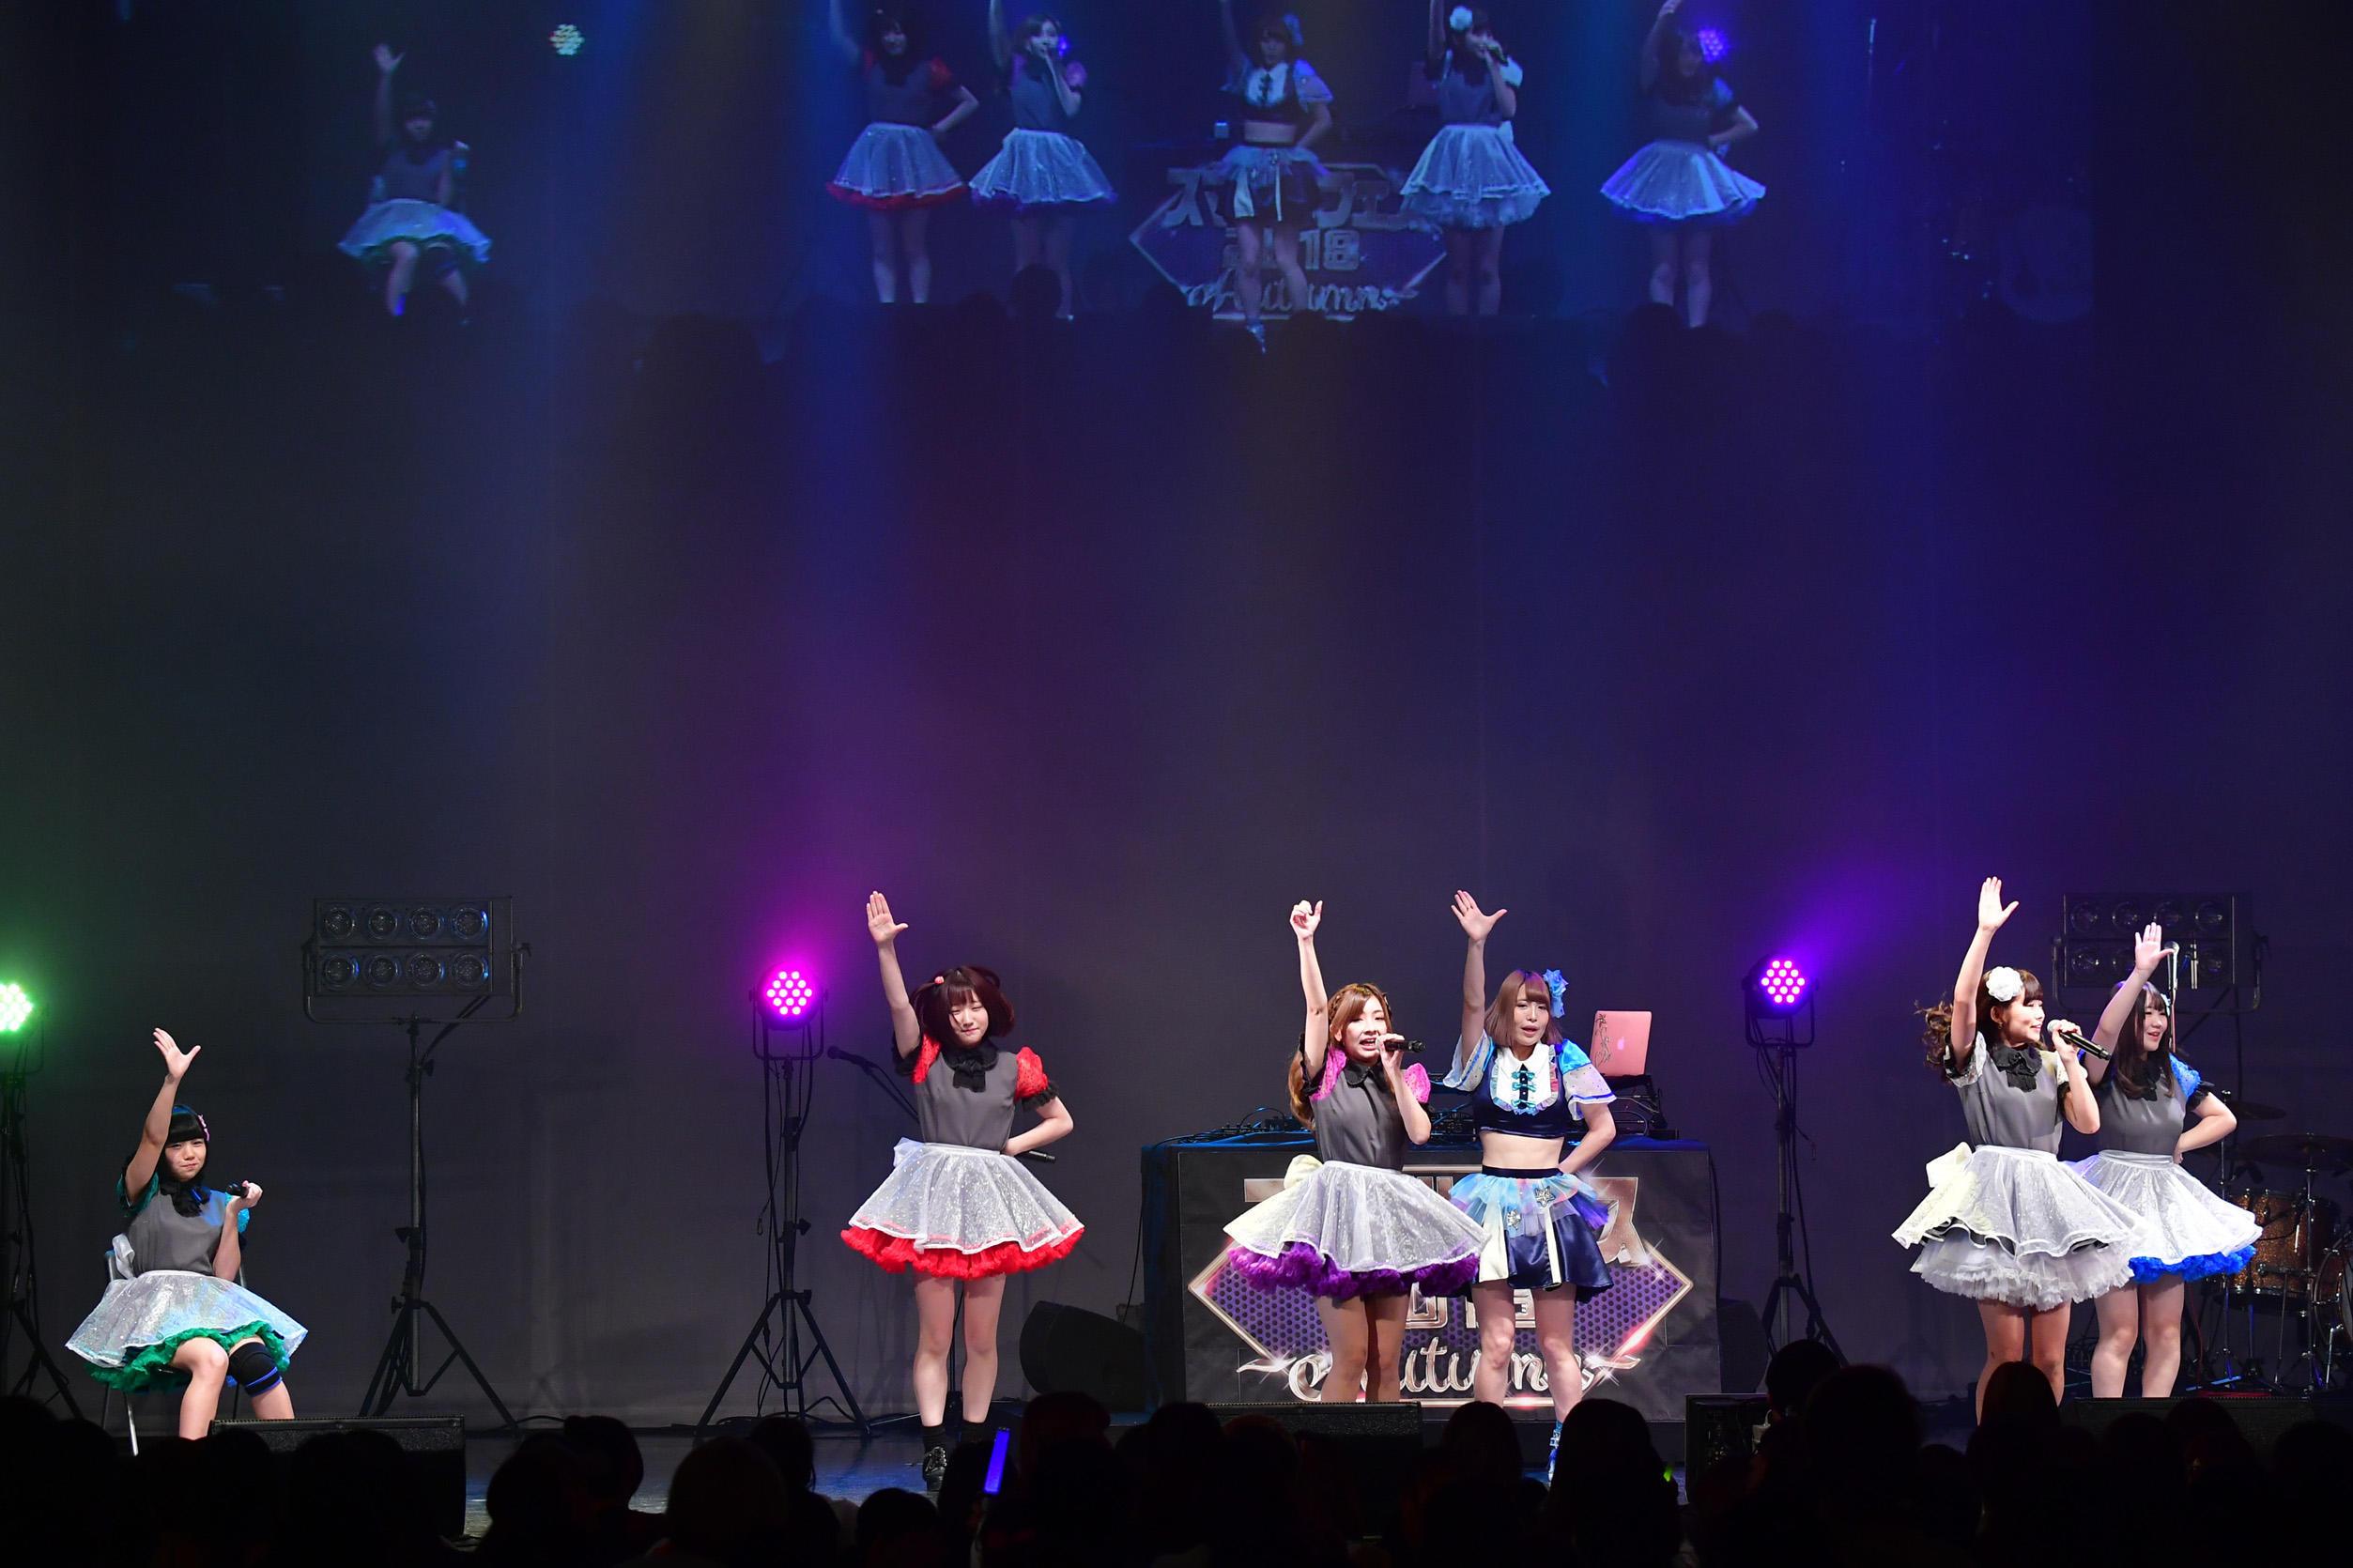 http://news.yoshimoto.co.jp/20181201024438-5543573531856b55528828d1252bed8def7137e6.jpg